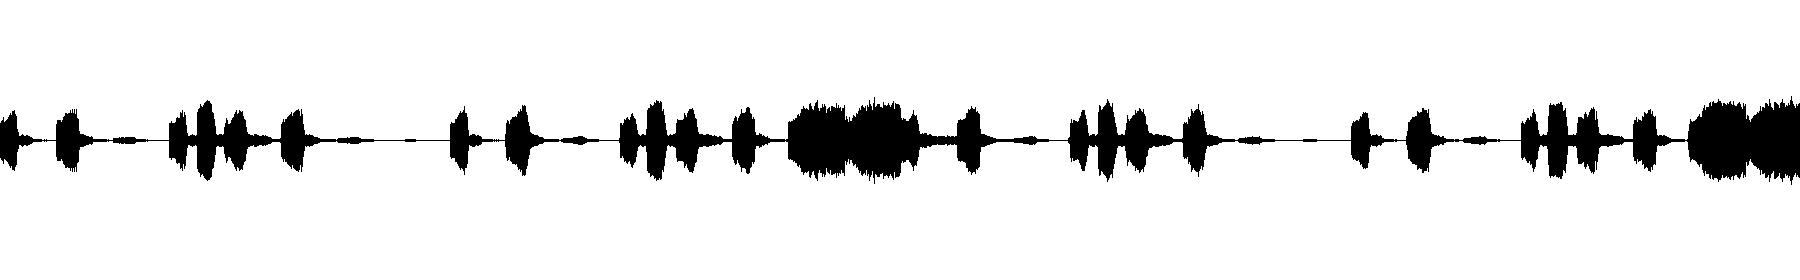 vocal hook trap 128bpm